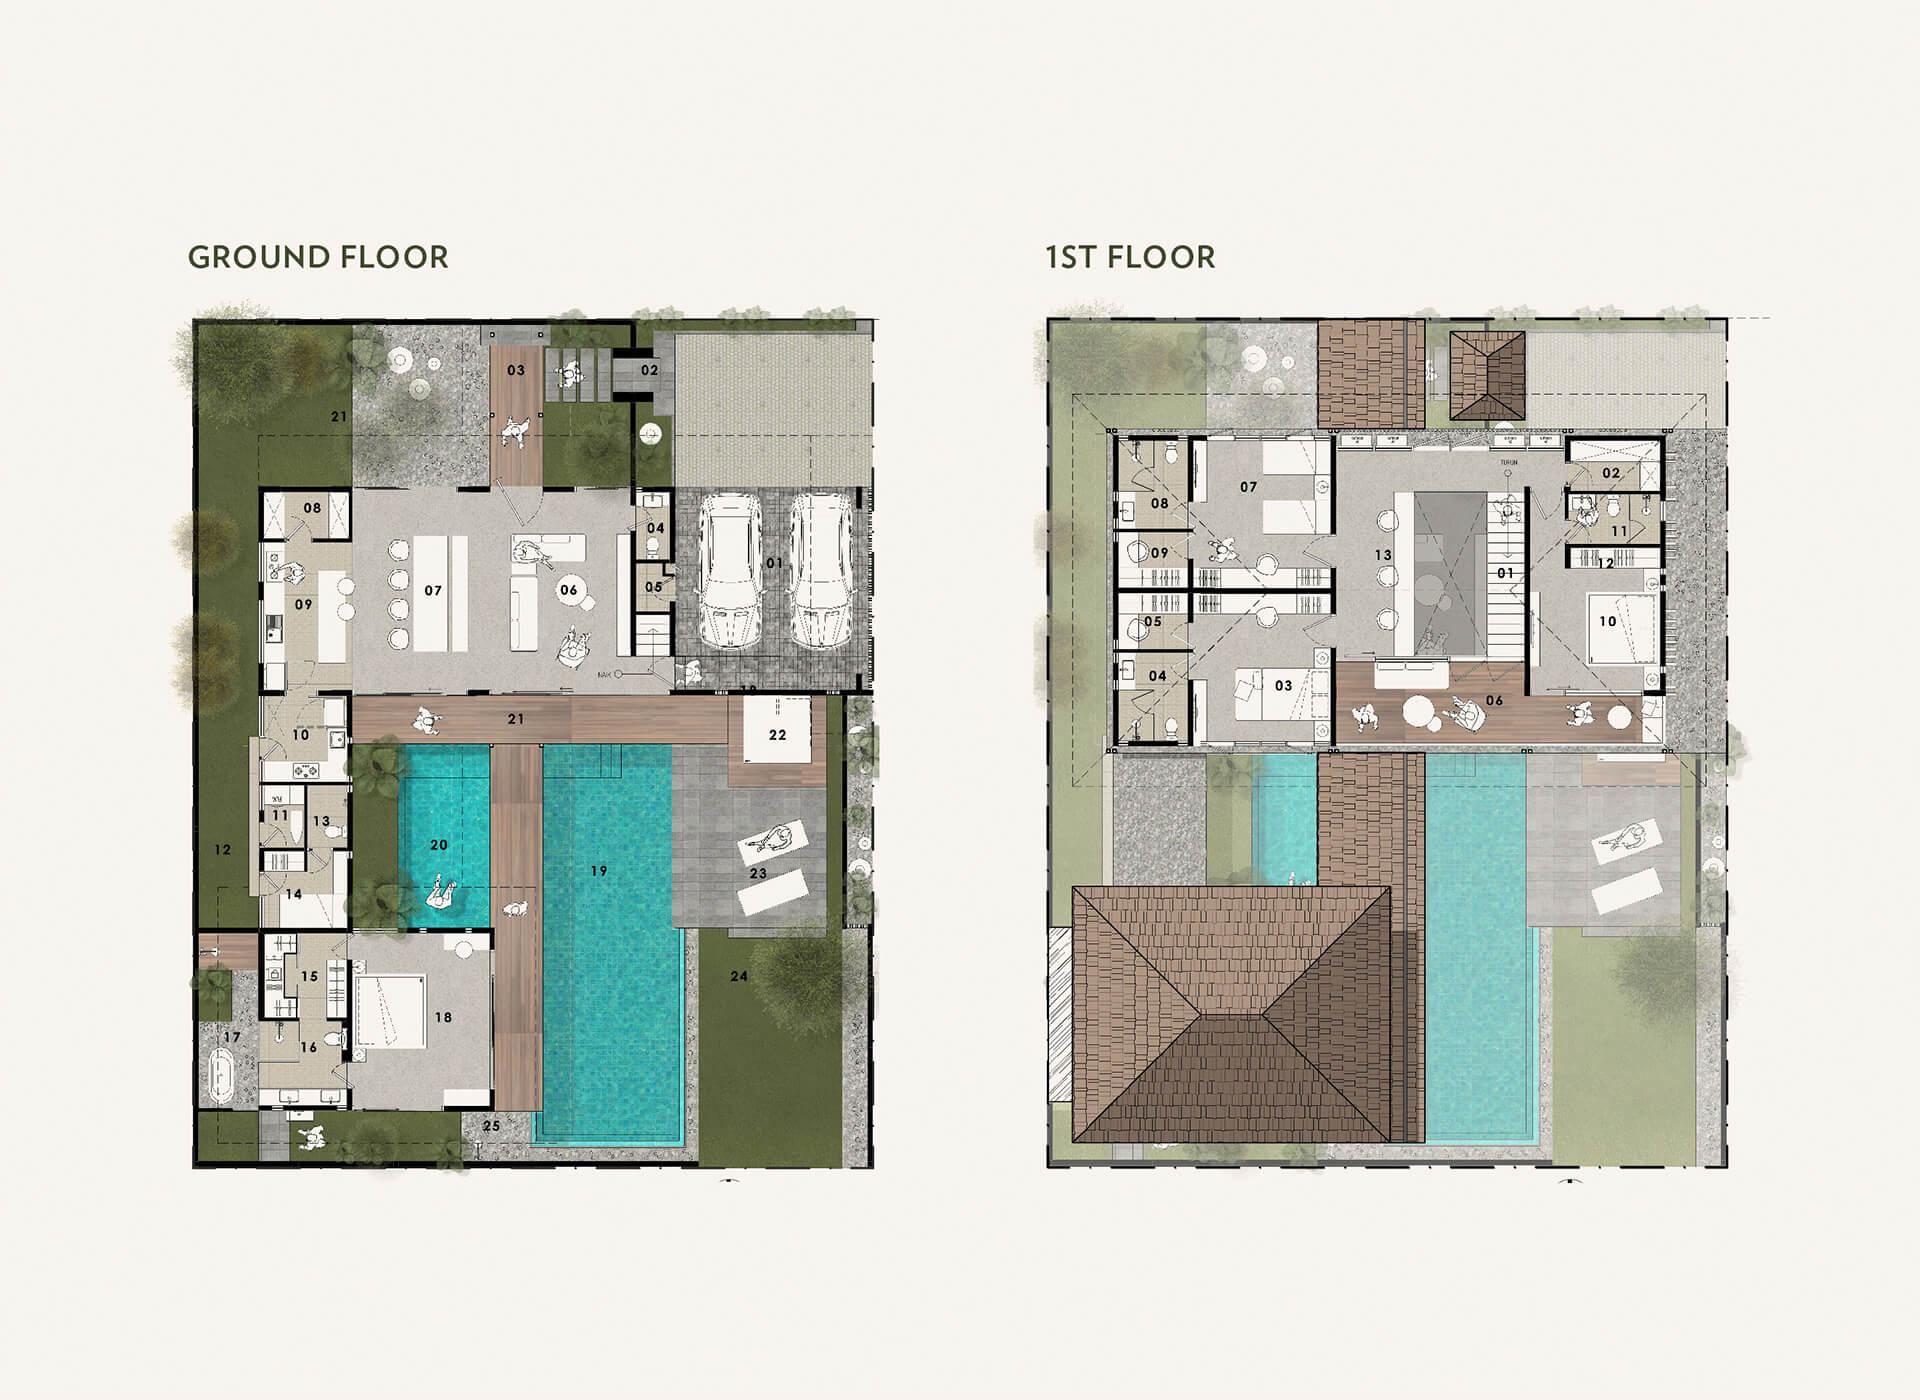 https://natadesa.com/wp-content/uploads/2021/08/Floorplan-rangrang.jpg